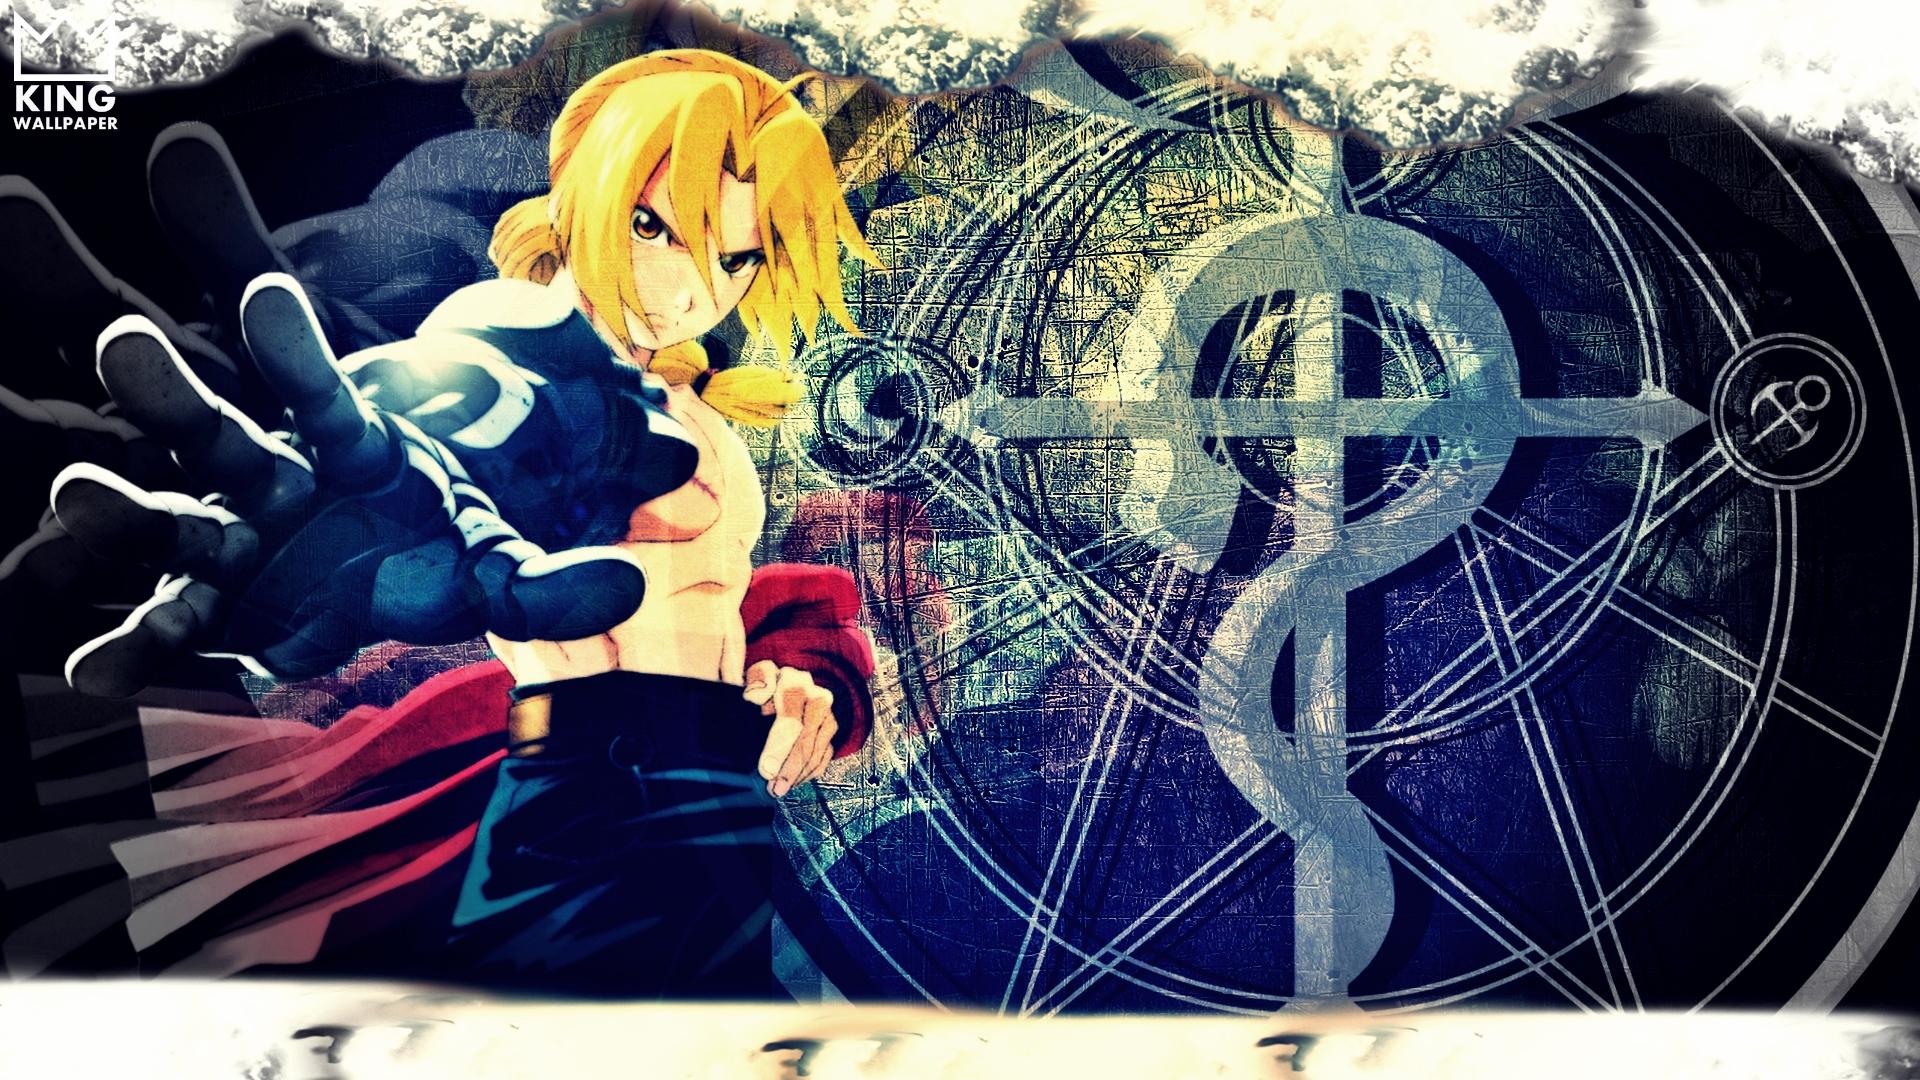 Edward elric wallpaper